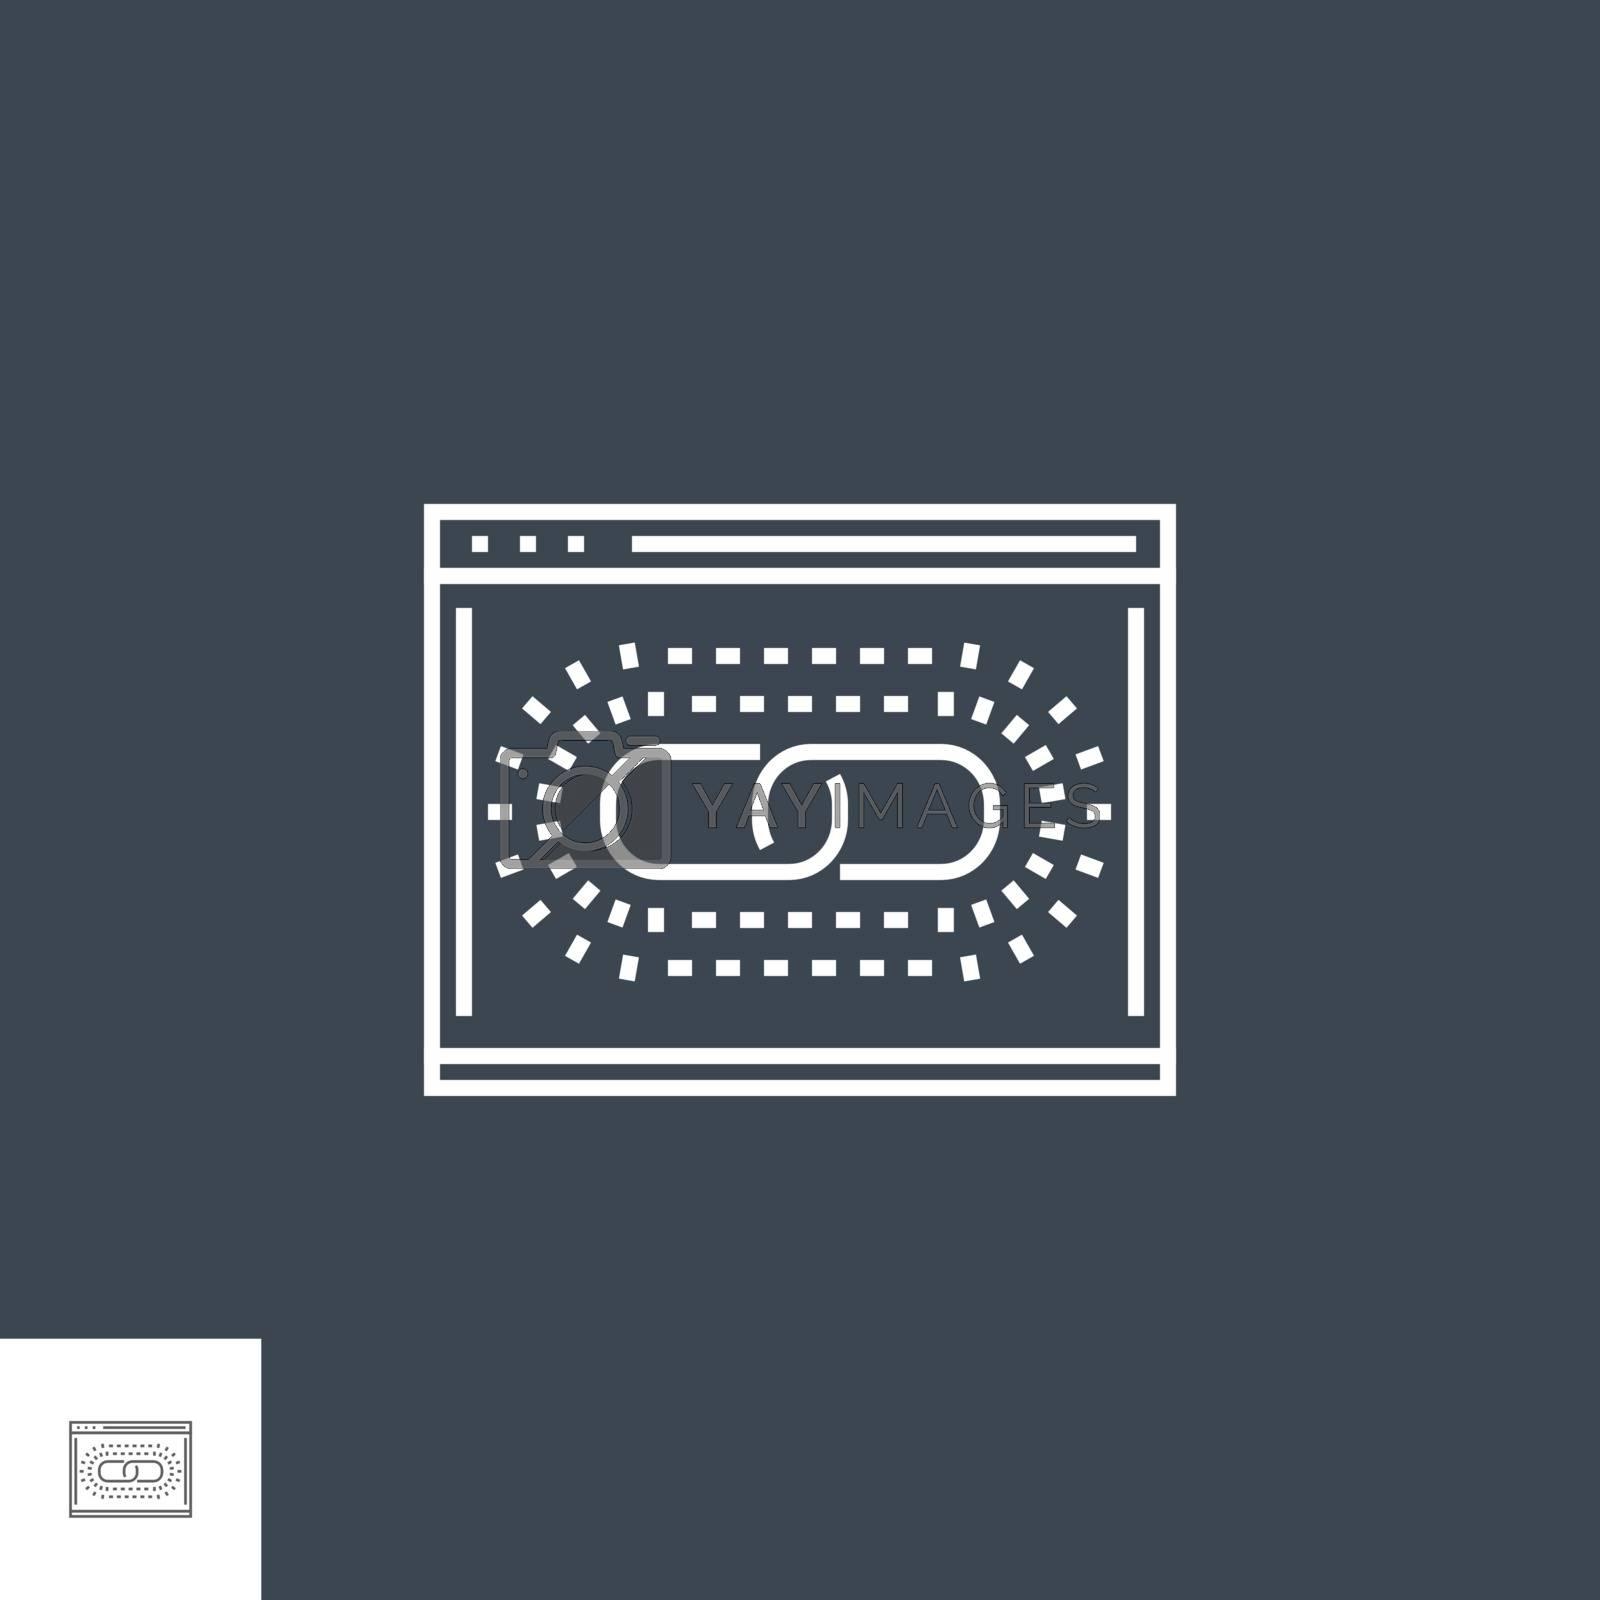 Web Link Optimization Line Icon by smoki